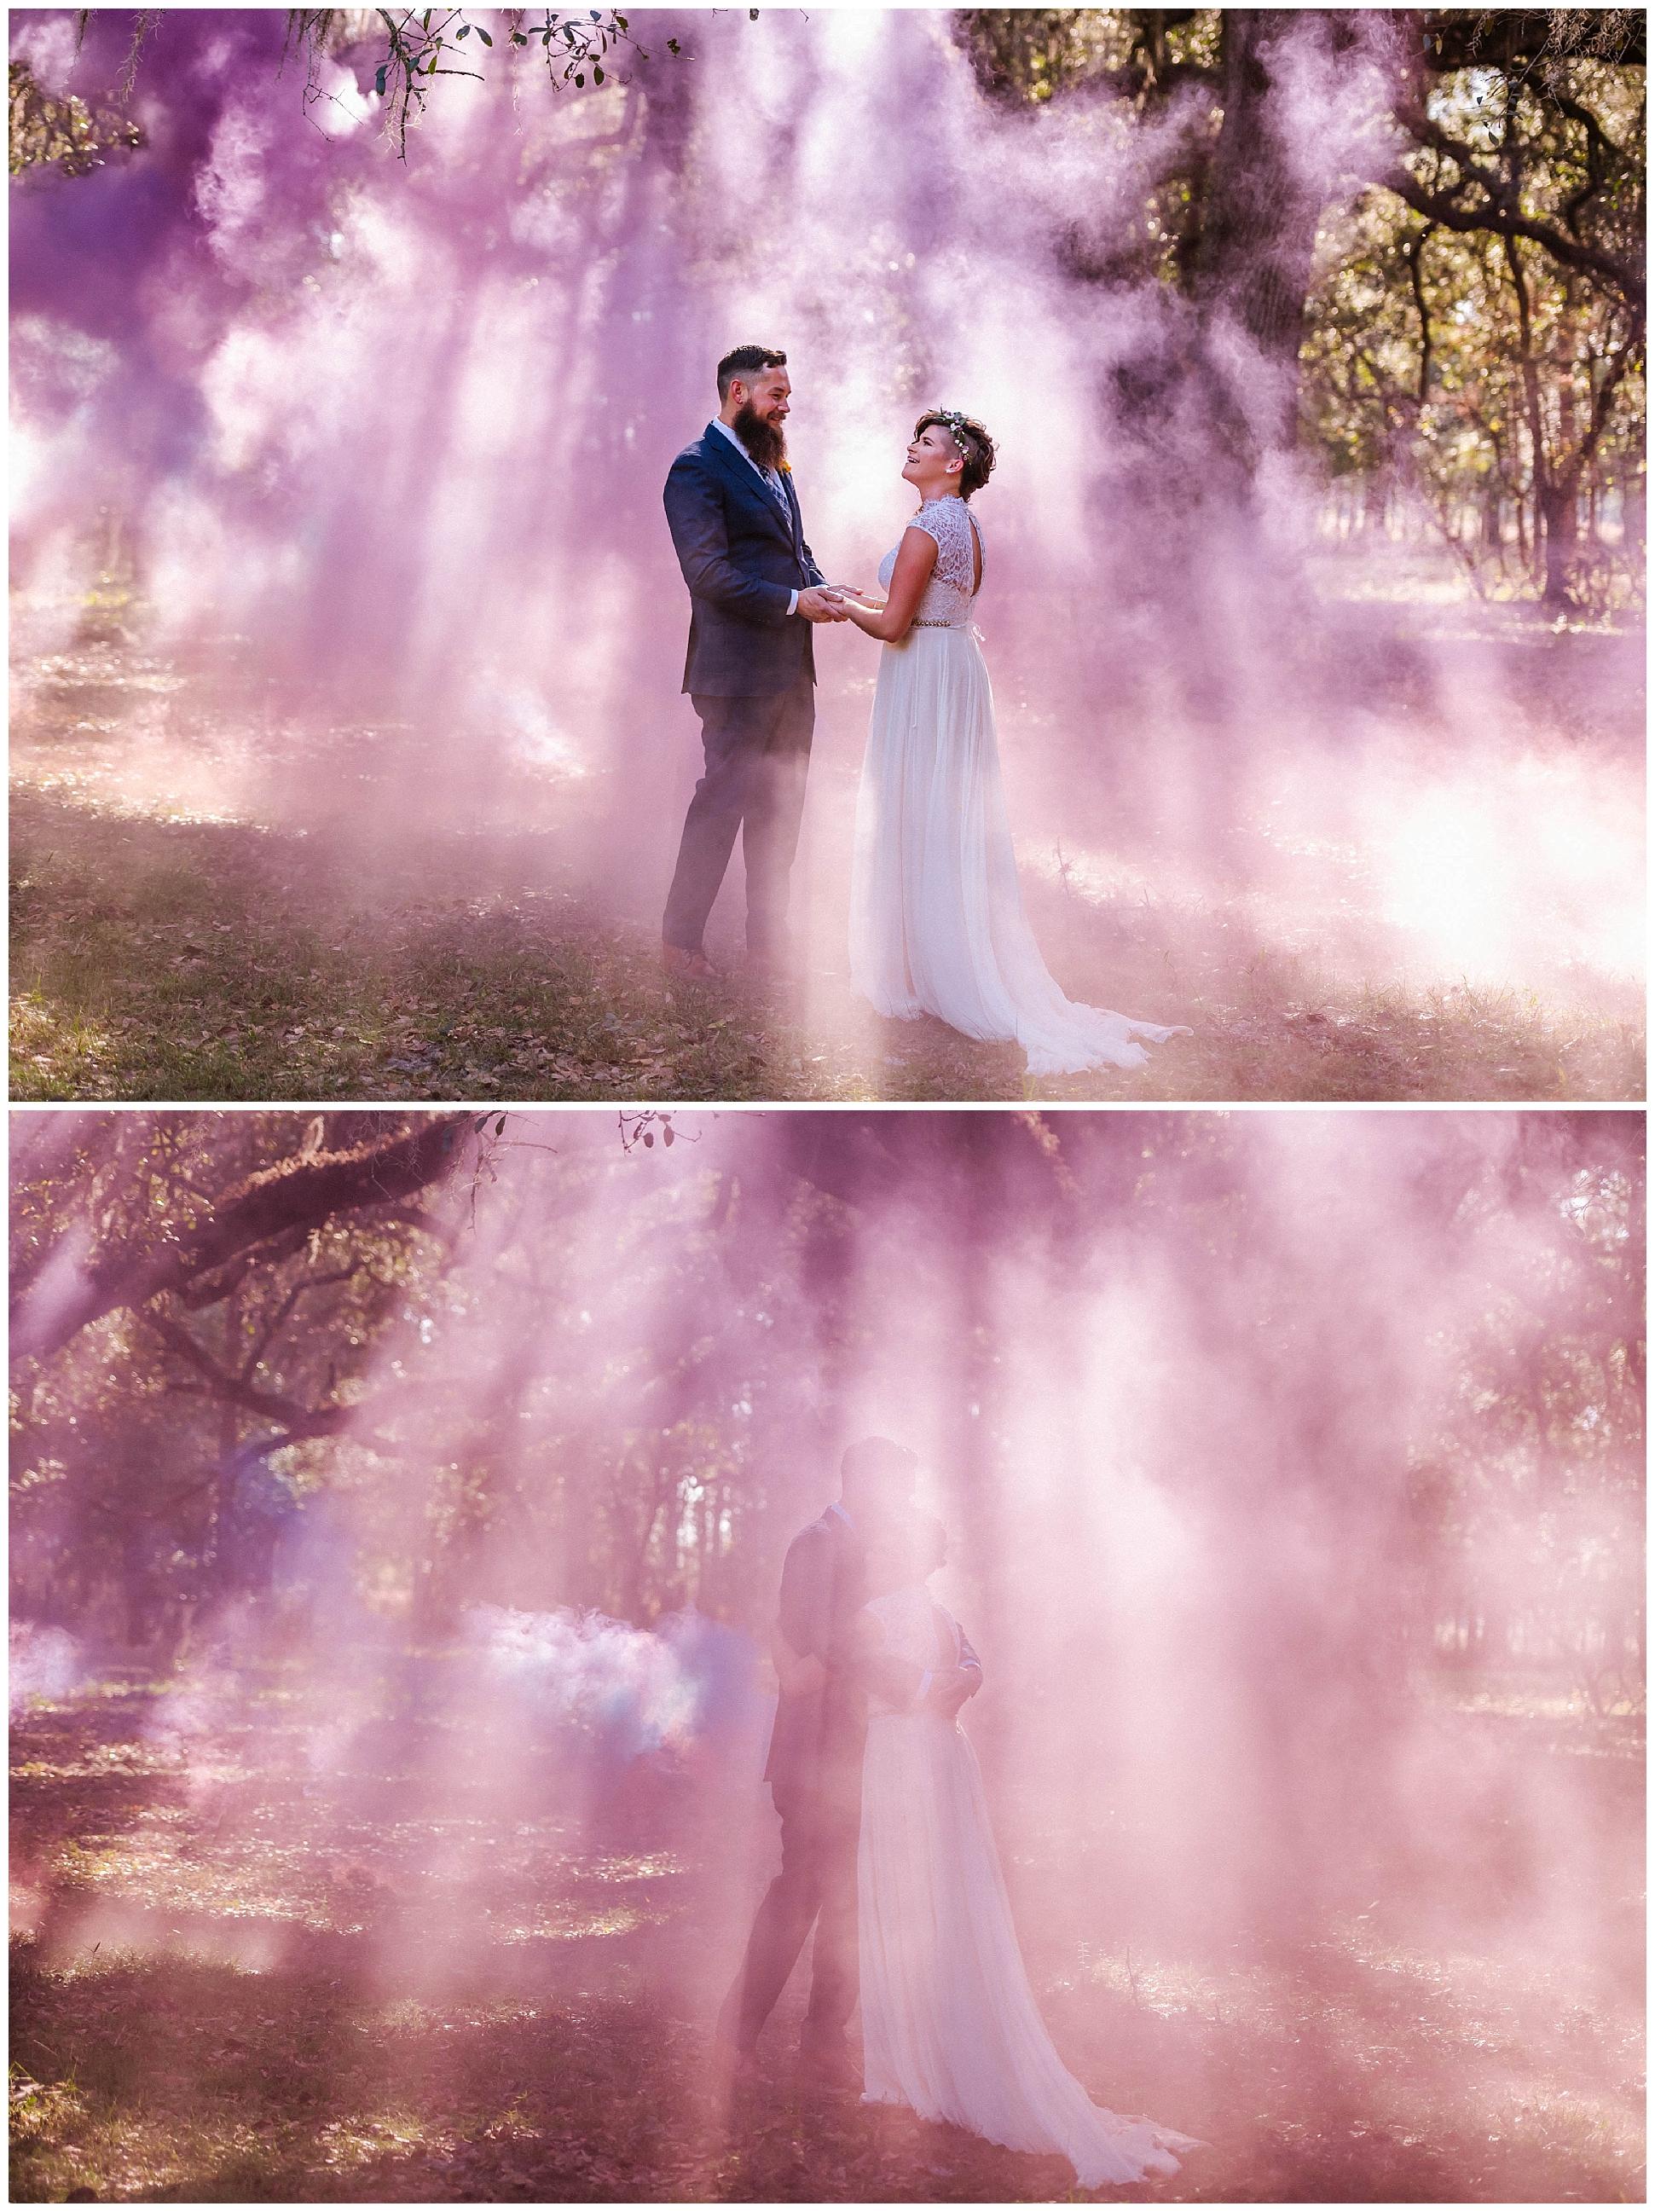 magical-outdoor-florida-wedding-smoke-bombs-flowers-crown-beard_0015.jpg